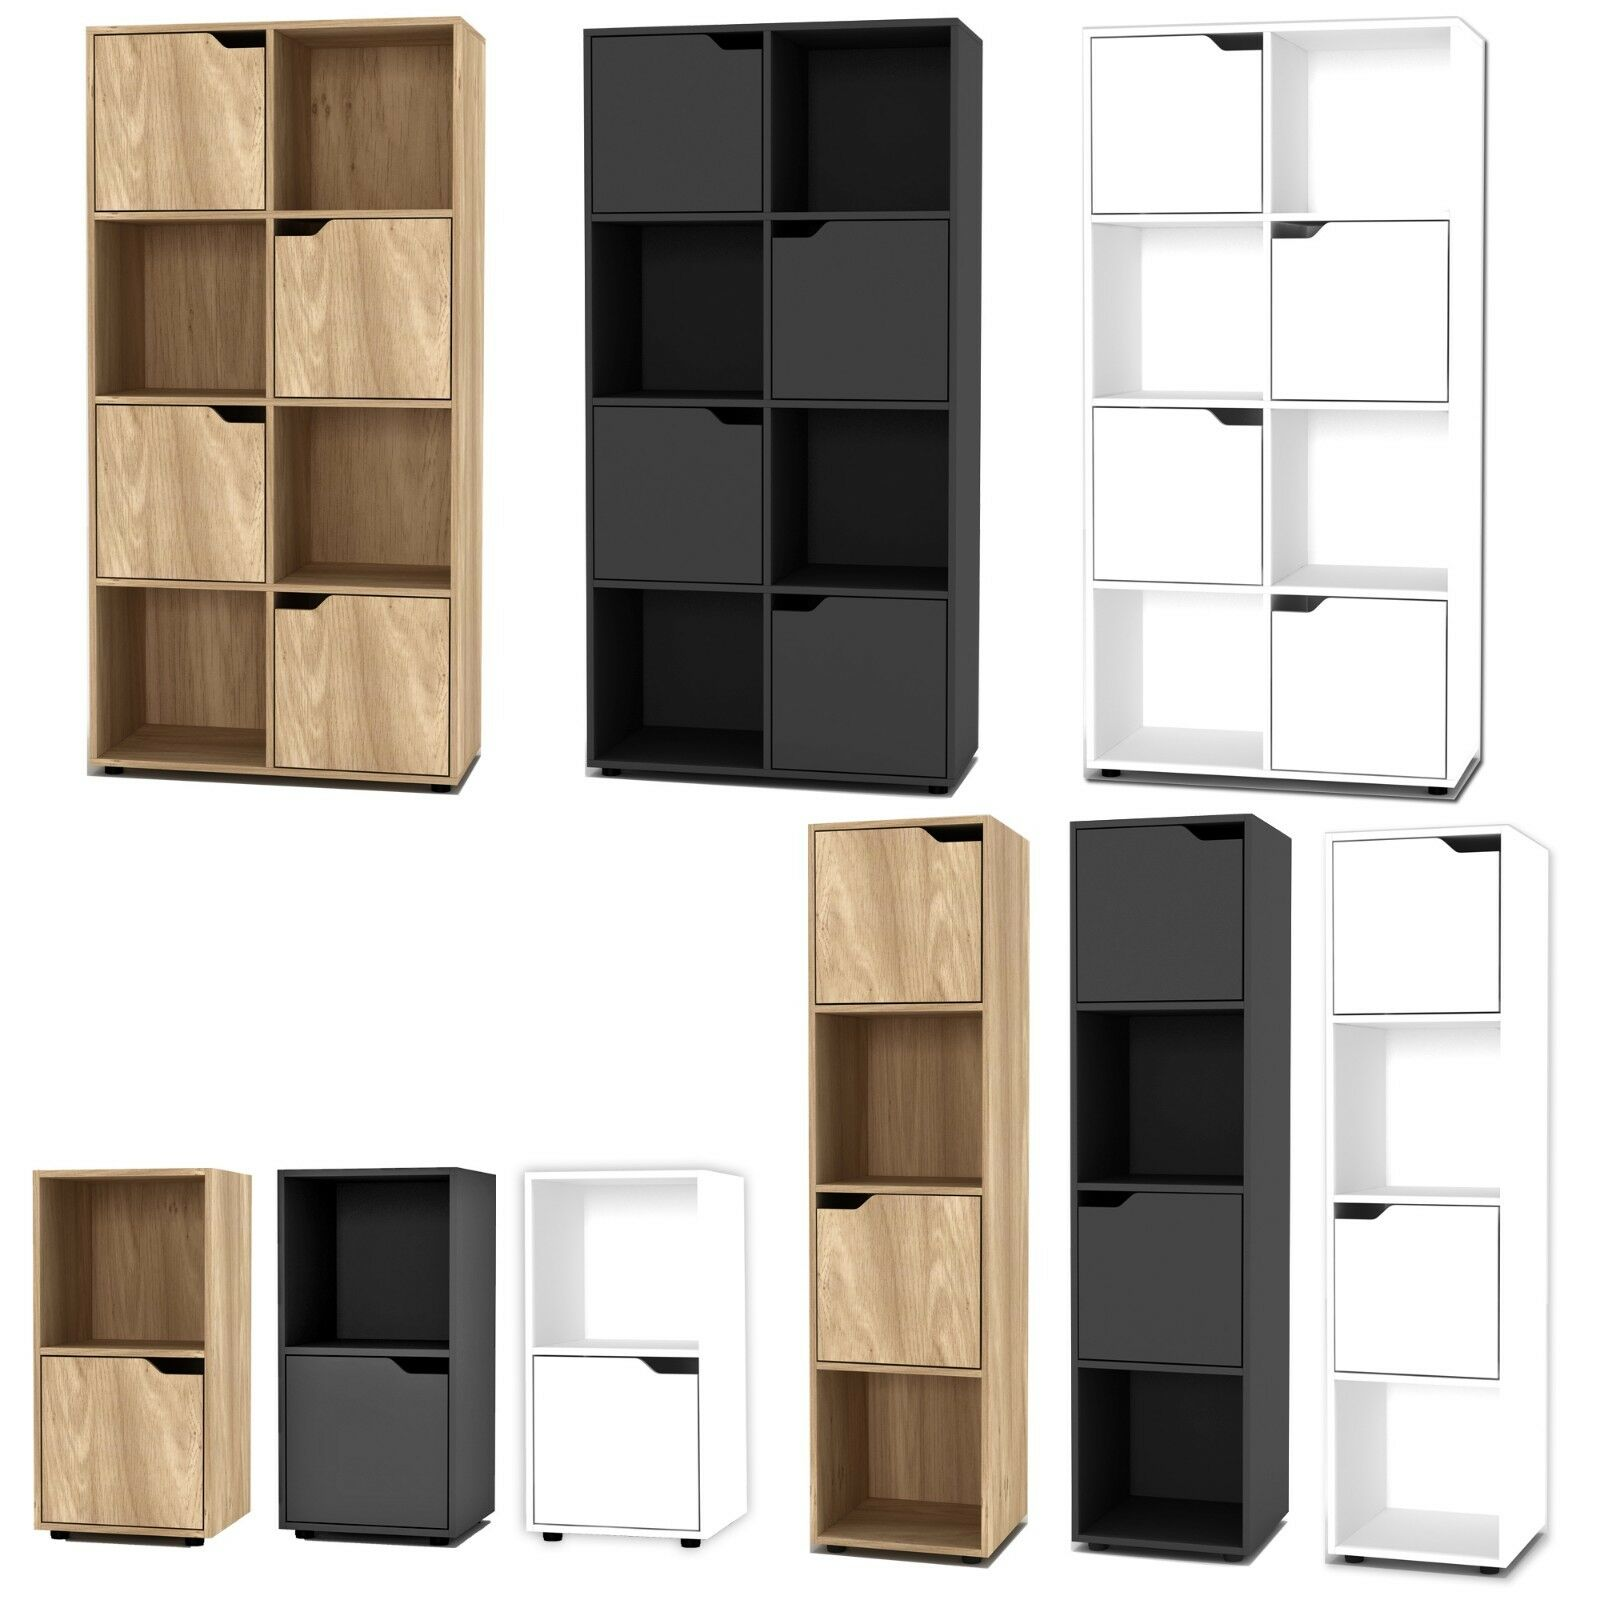 Sideboard Dovetail Calville Gl Doors